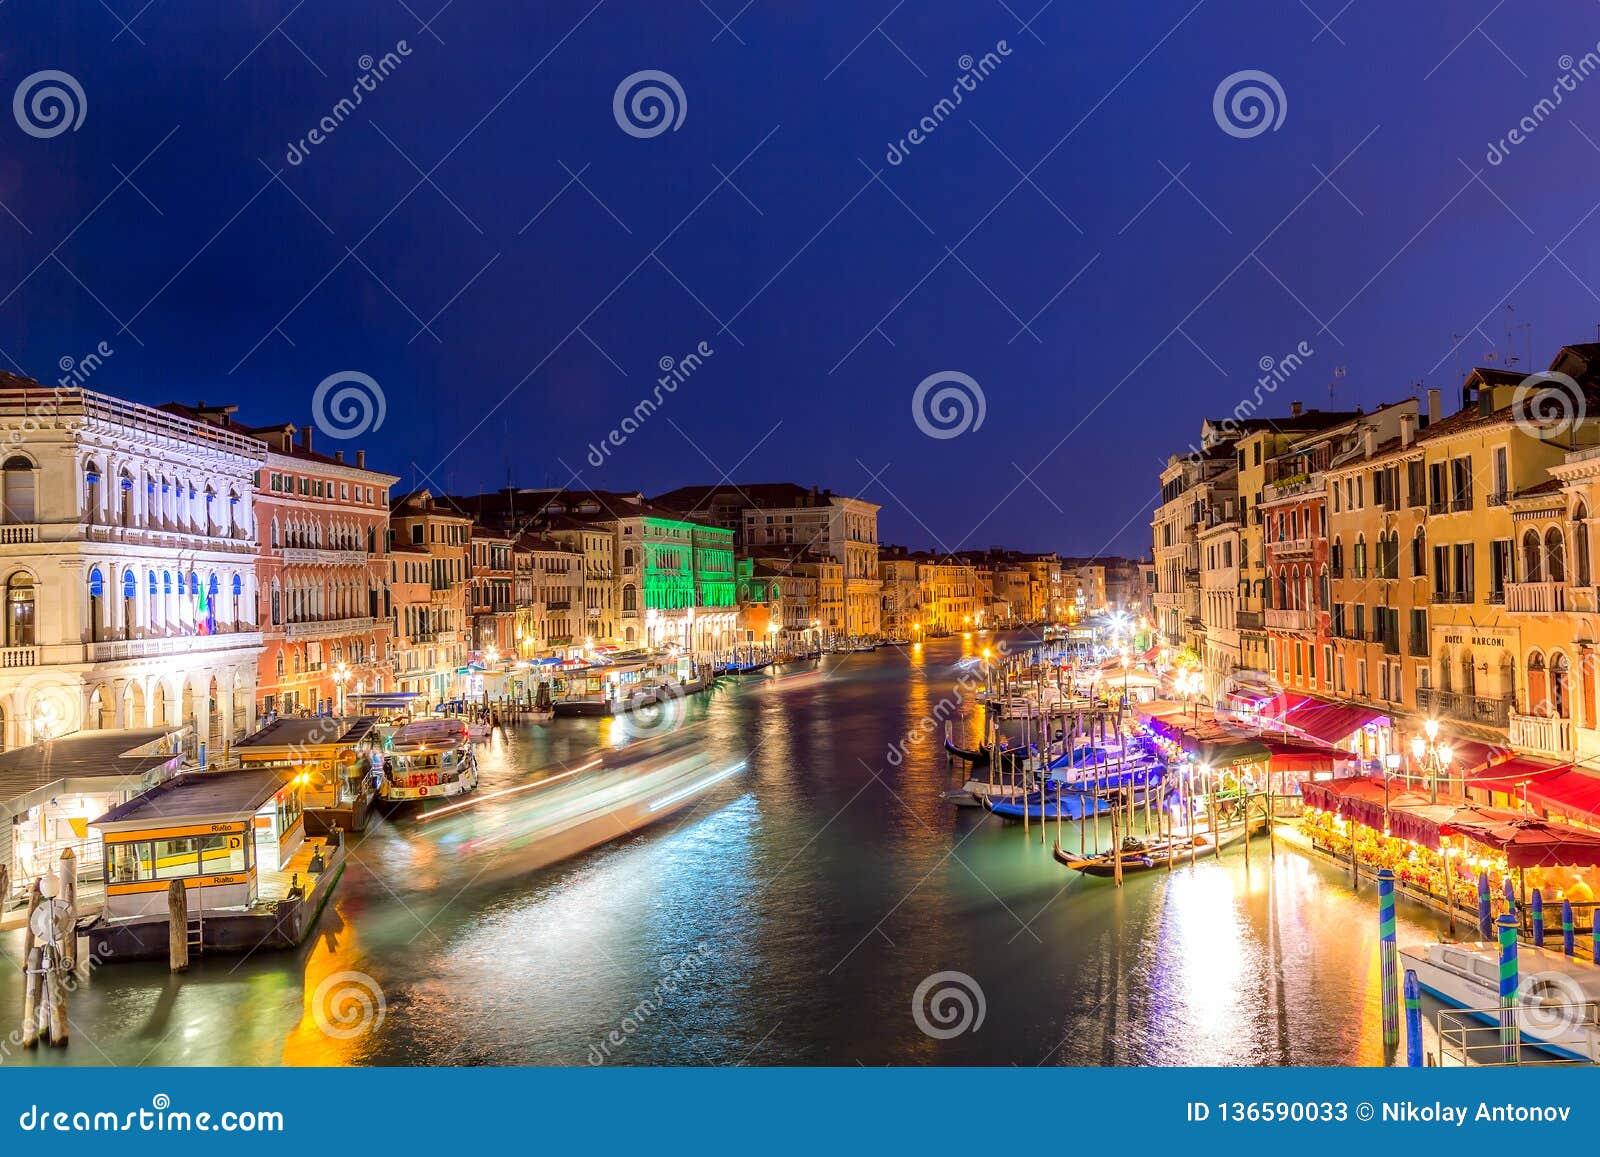 Venetië, Italië - September, 2018: Grand Canal bij zonsondergangschemering in Venetië, Italië Mening van Brug Rialto